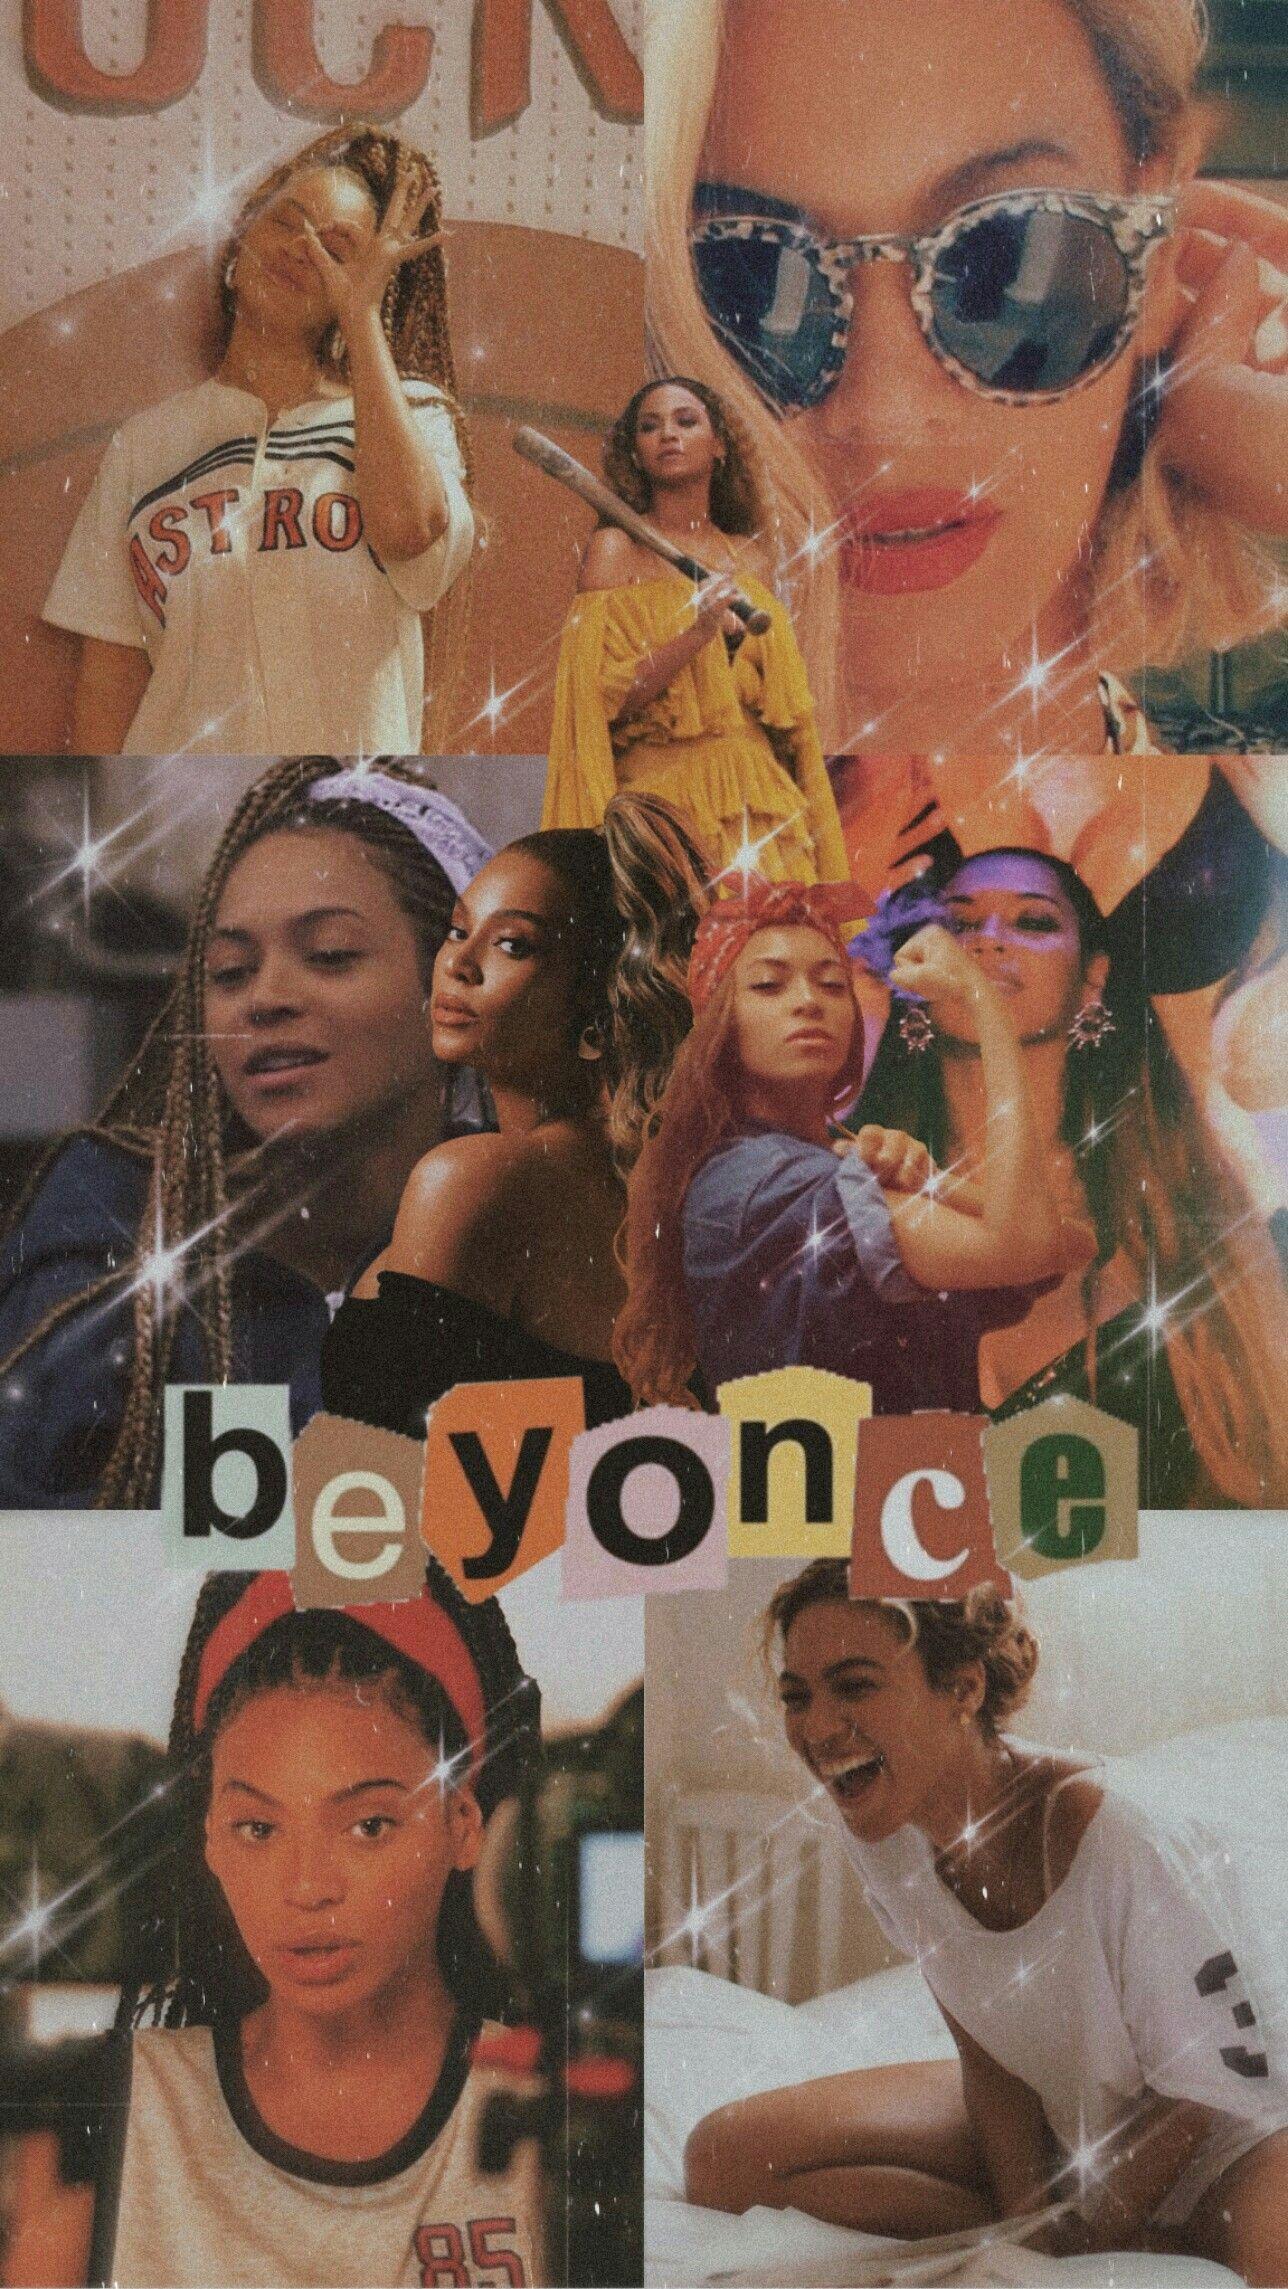 Beyonce Wallpaper Bad Girl Wallpaper Iconic Wallpaper Iphone Wallpaper Vintage